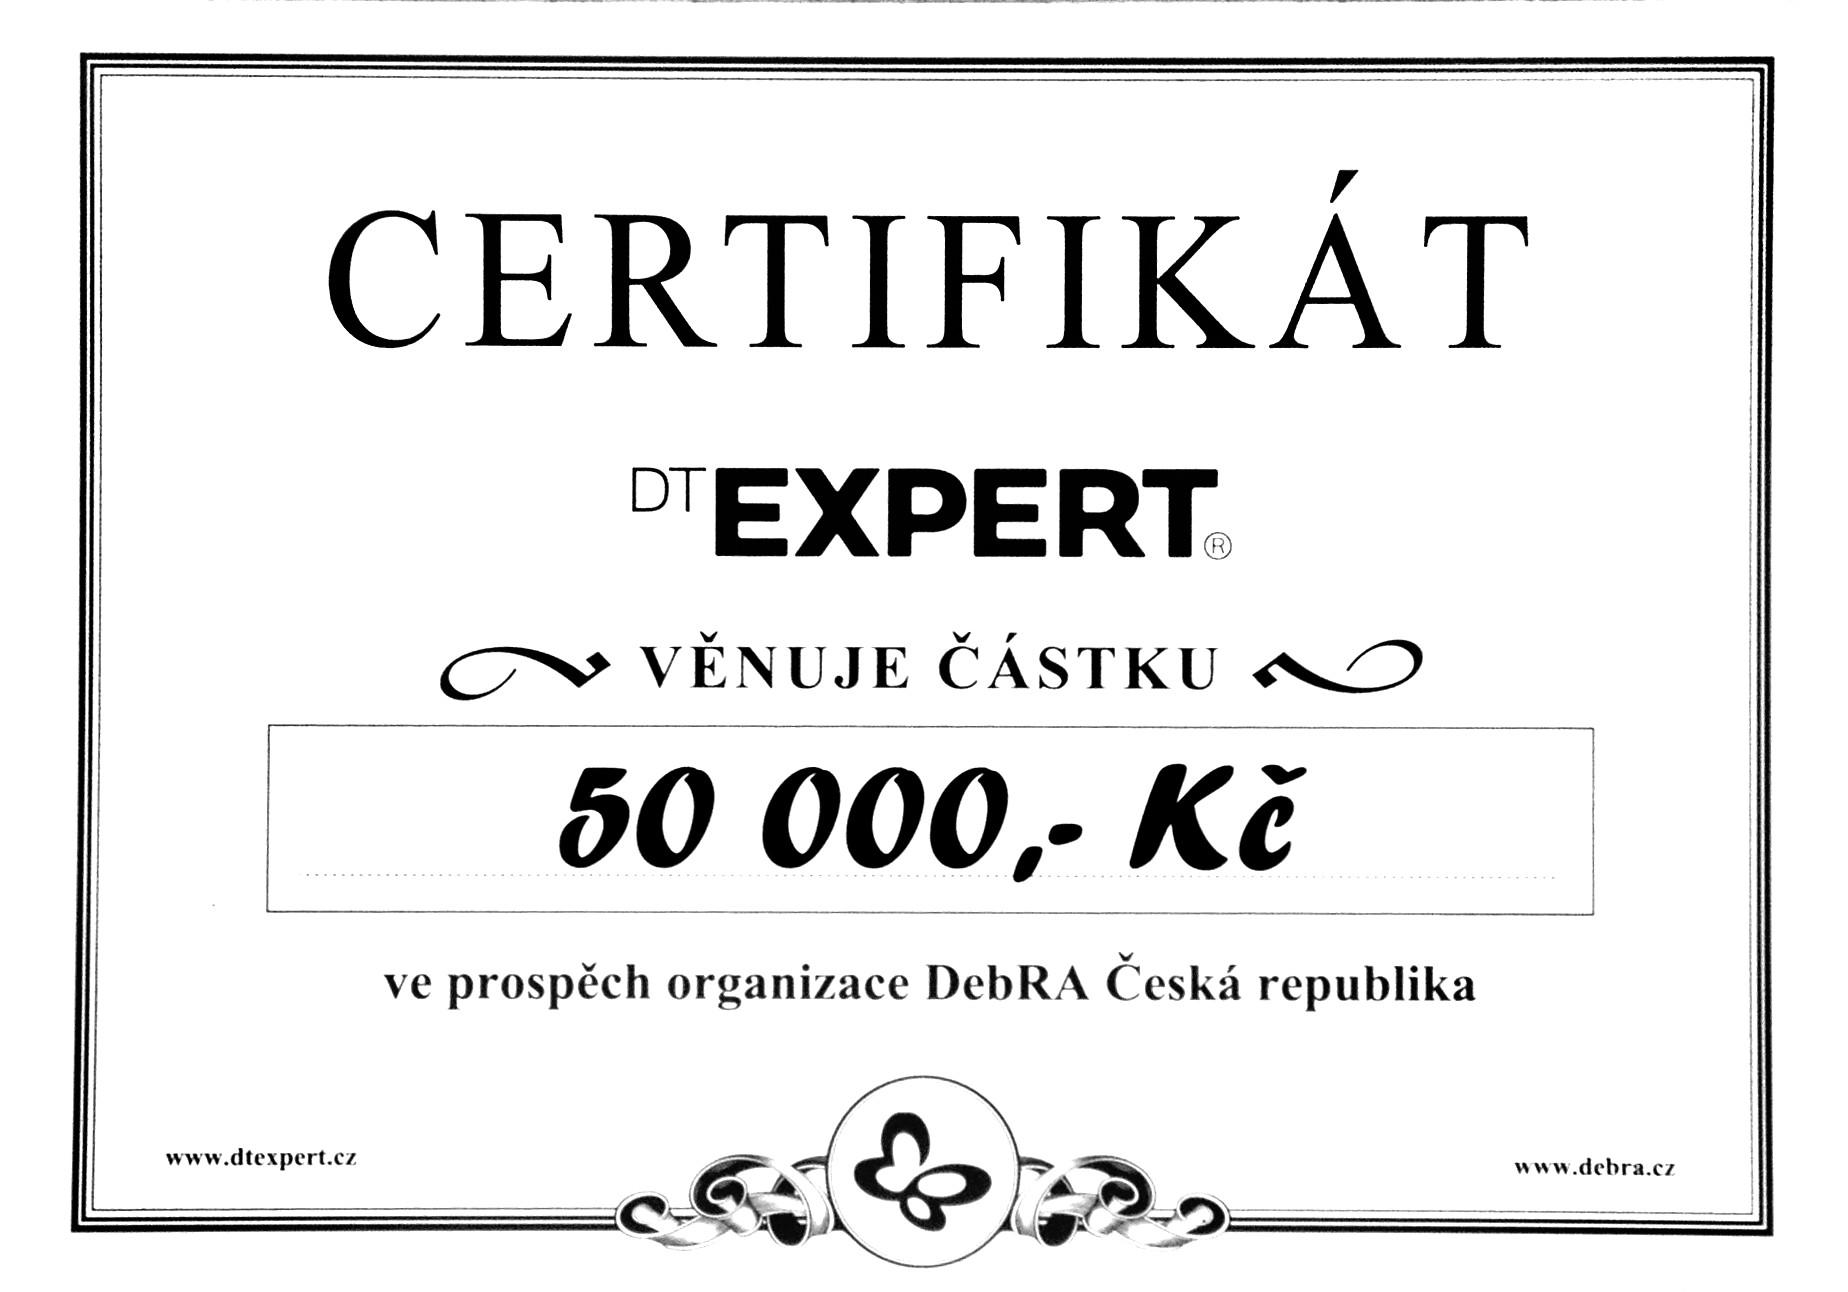 We Support Dt Expert